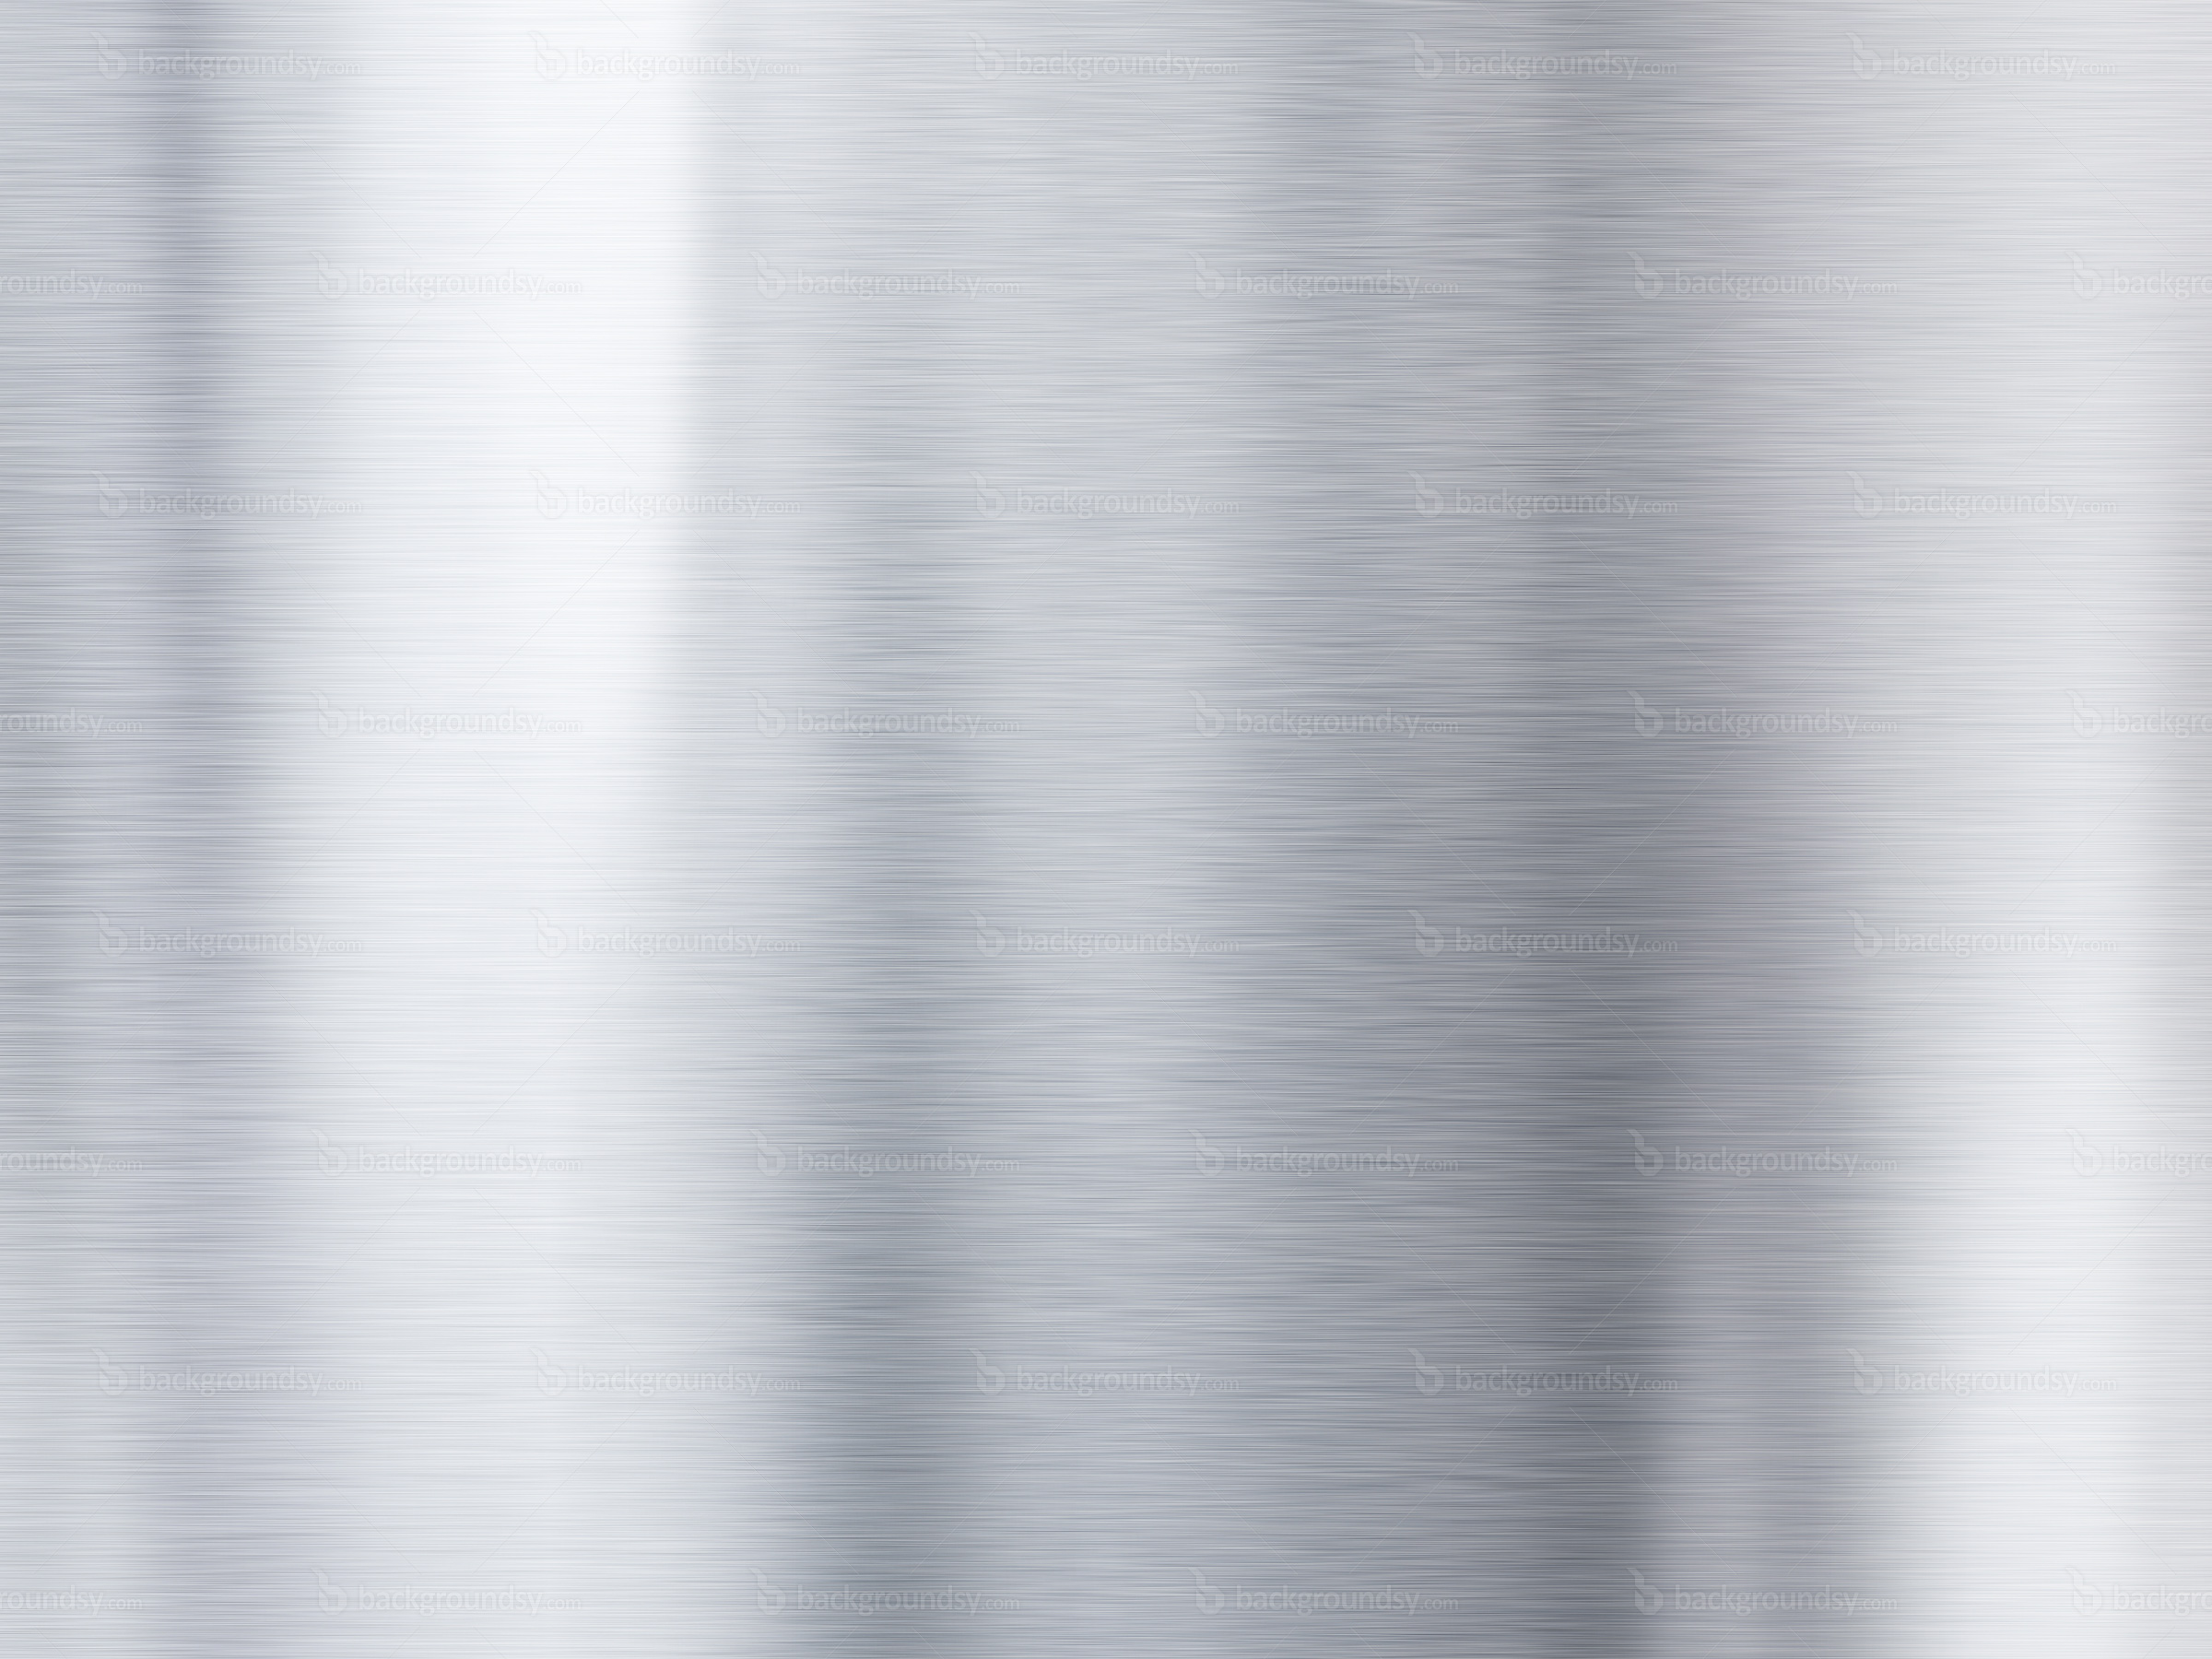 Silver photo